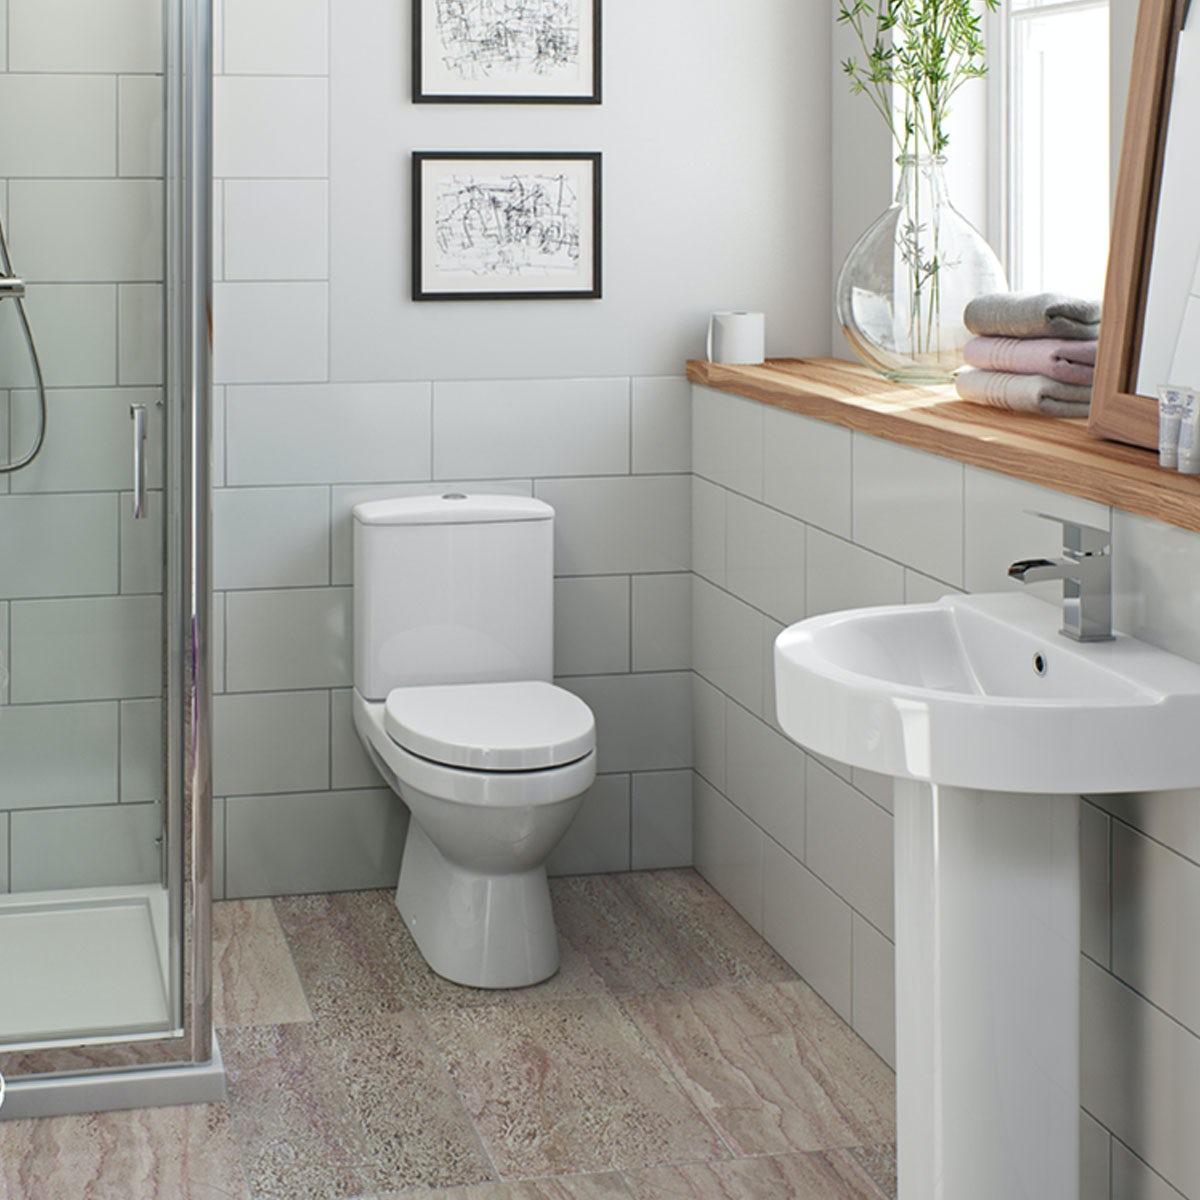 British ceramic tile pure white satin tile 298mm x 498mm british ceramic tile pure white satin tile 298mm x 498mm dailygadgetfo Images